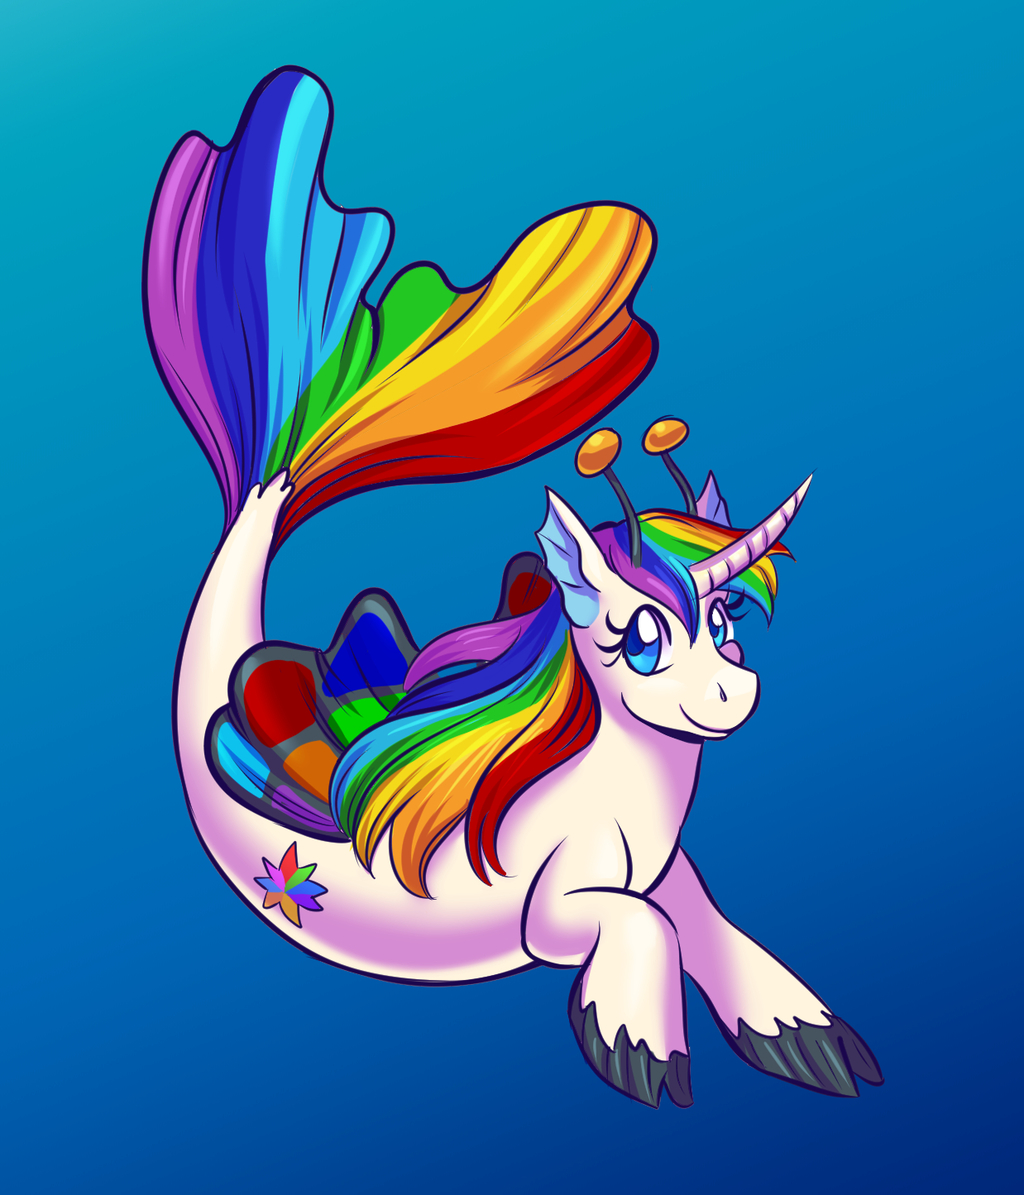 Most recent image: ranebo-pony-sea-mk04r